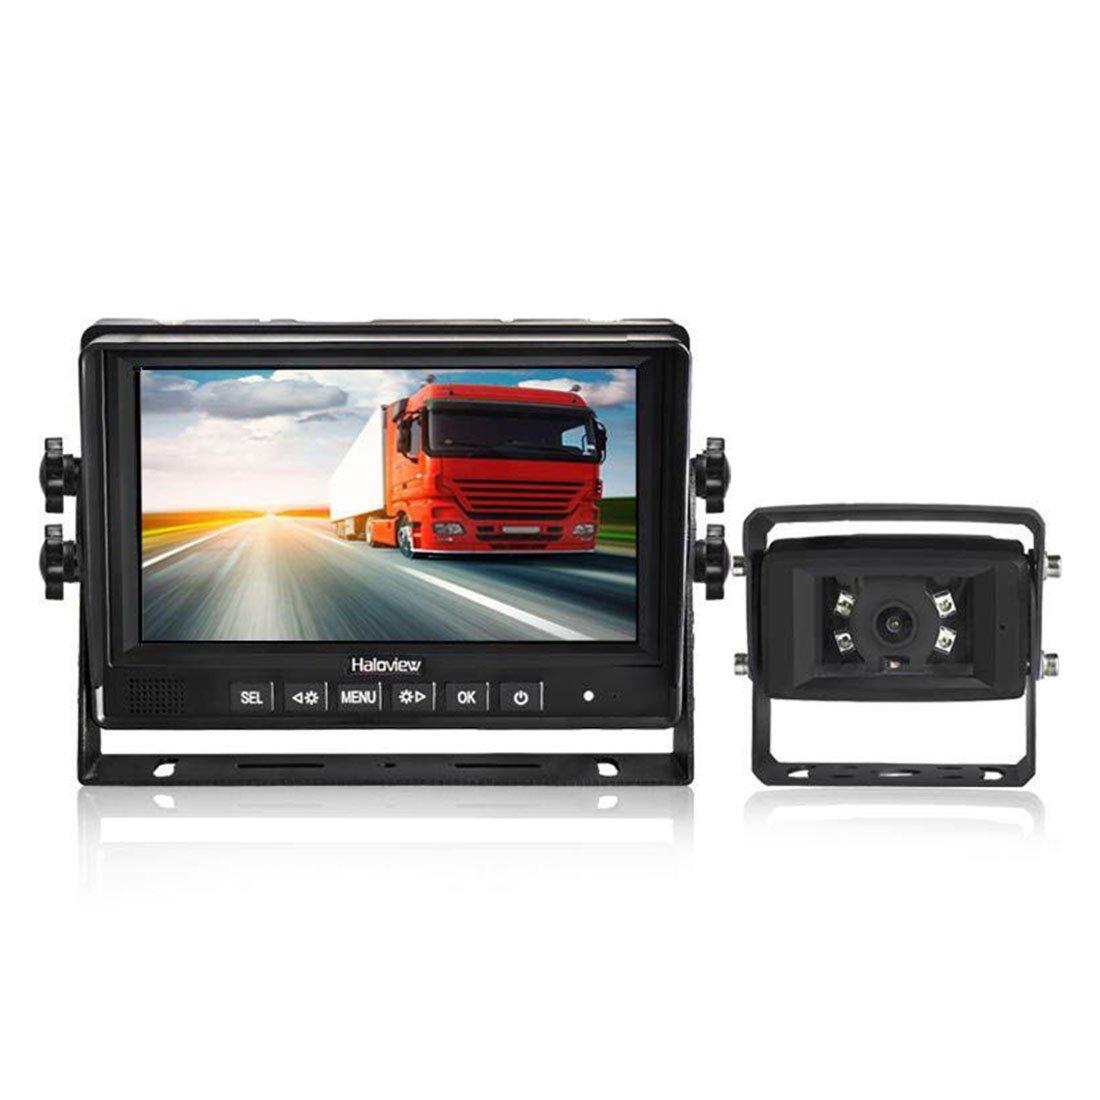 MC7601 Wolfwhoop 5558990295 Haloview MC7601 Backup Camera System Kit 7 LCD Reversing Monitor and IP69K Waterproof Rear View Camera for Truck//Trailer//Bus//RV//Pickups//Camper//Van//Farm Machine Car